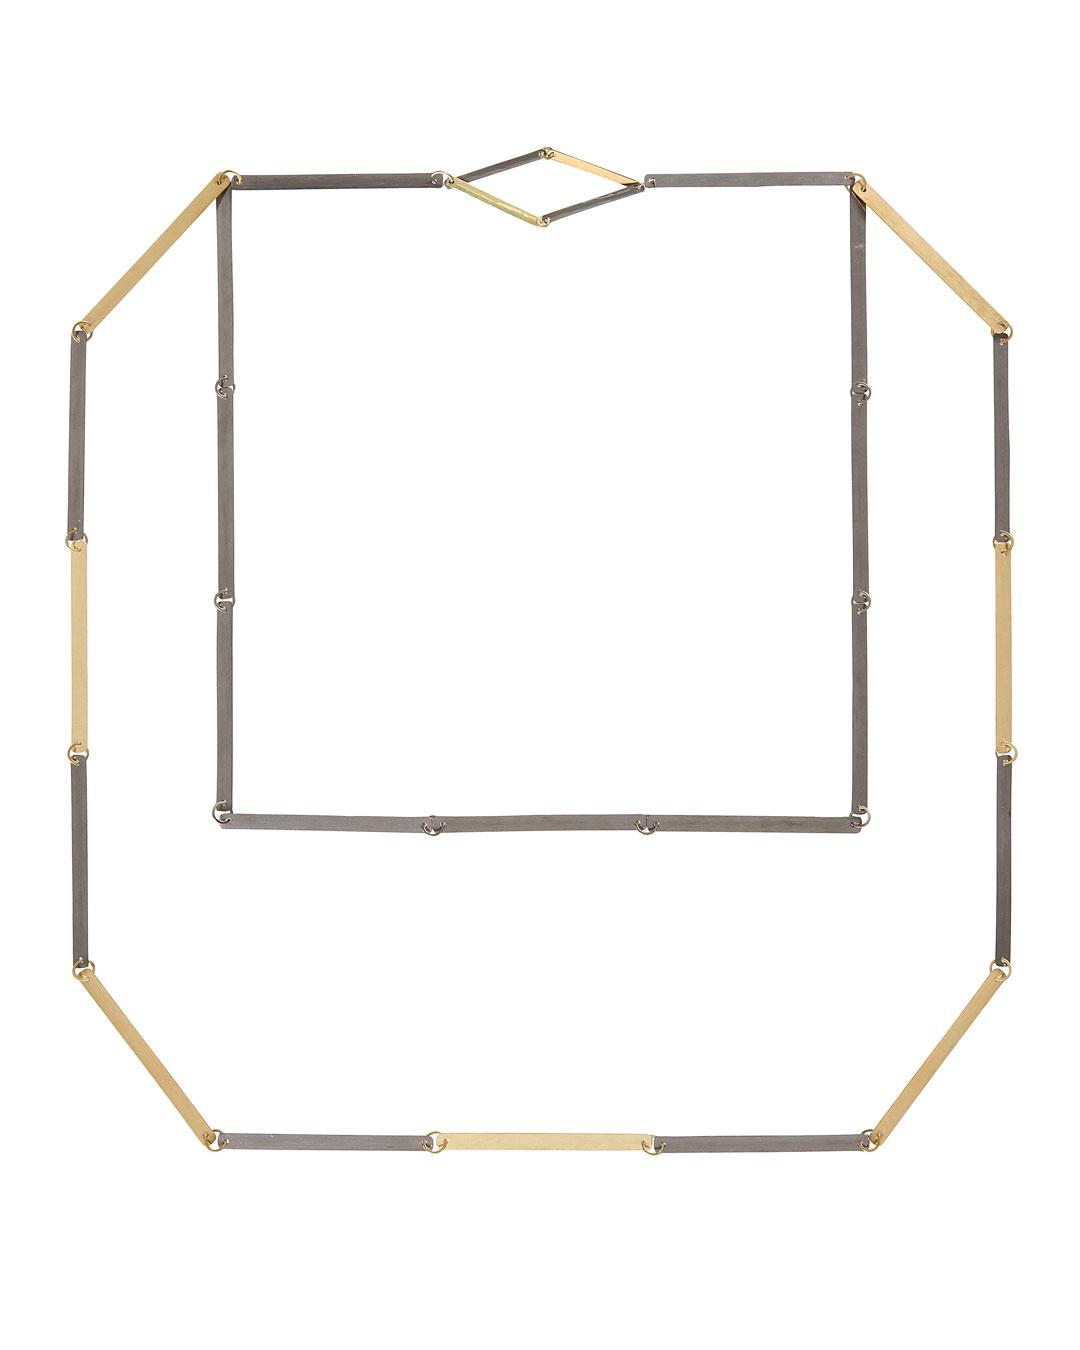 Annelies Planteijdt, Mooie stad – Collier en tegels (Beautiful City - Necklace and Floor Tiles), 2017, necklace; gold, tantalum, 300 x 270 mm, €7450 (image 1/3)